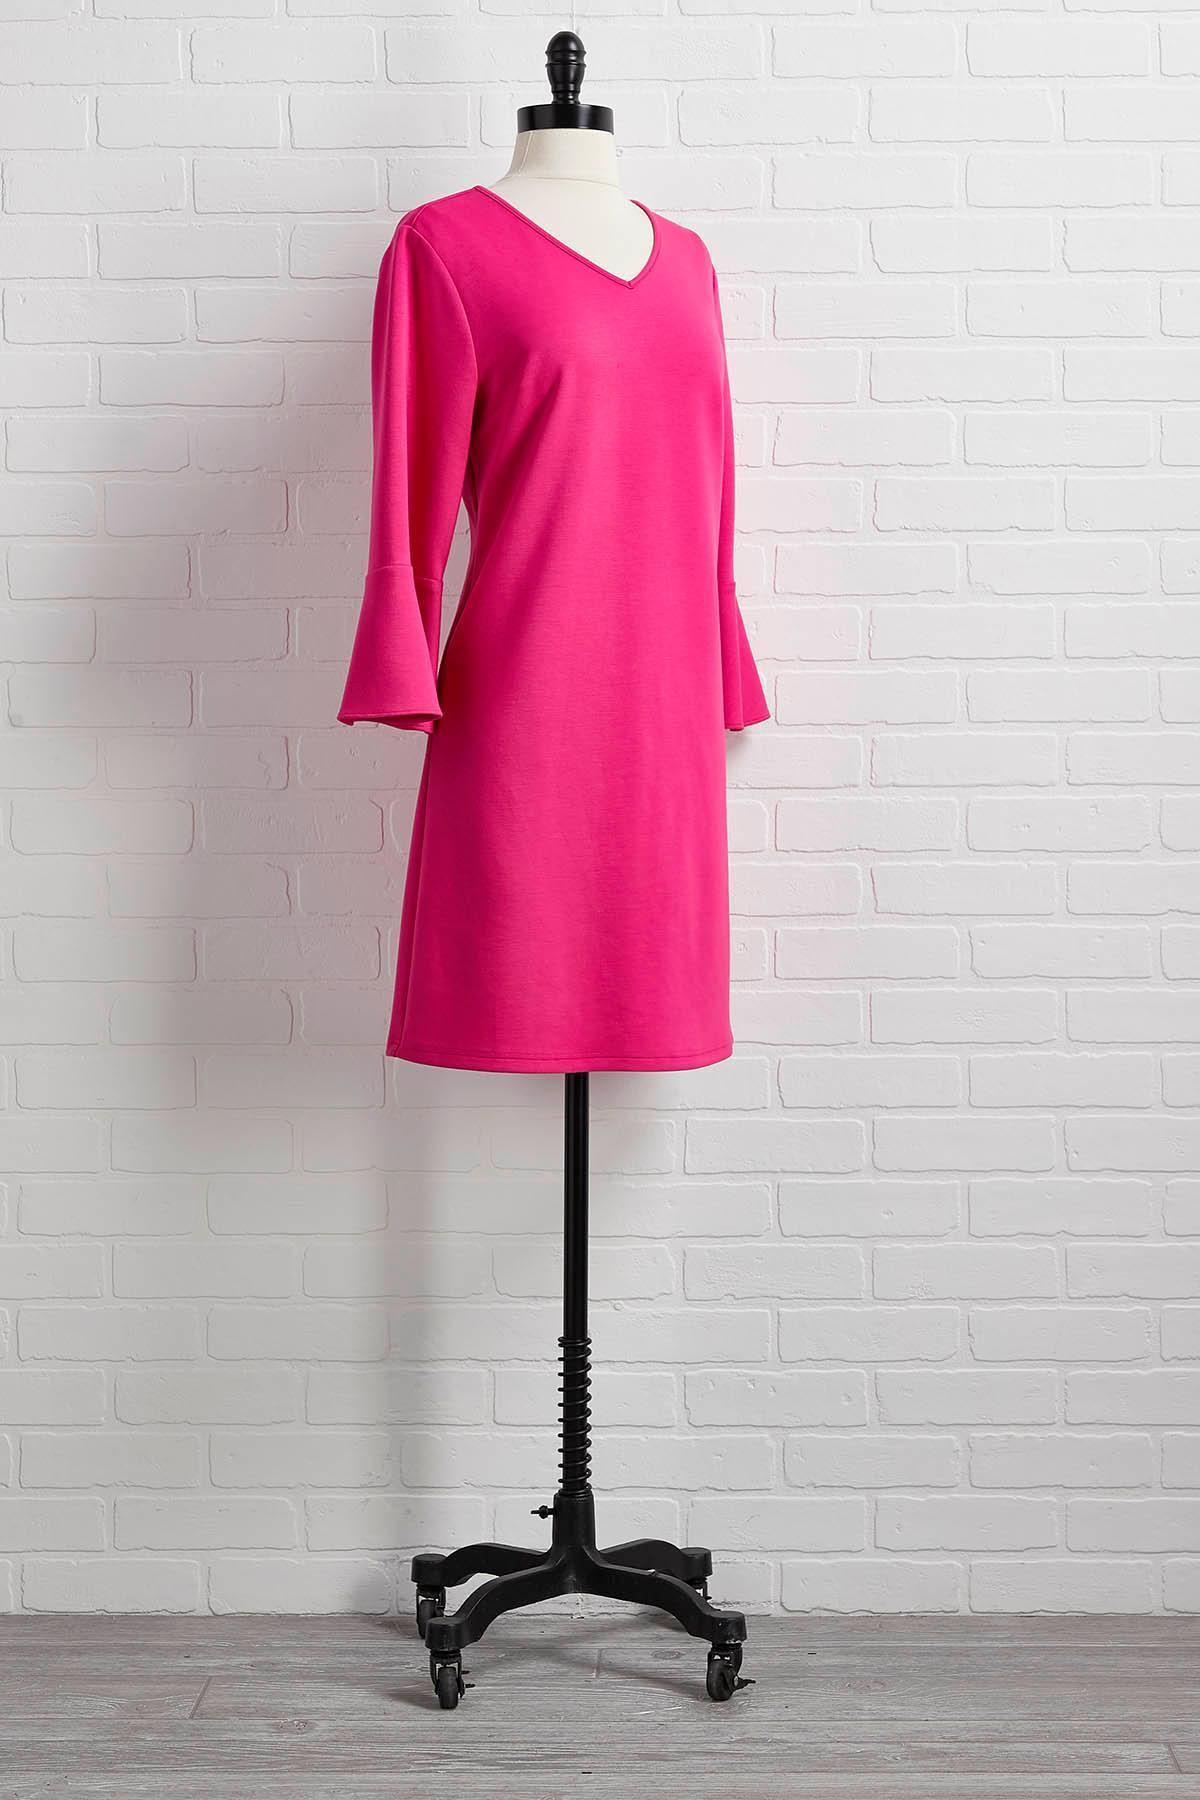 Gone In A Pink Dress